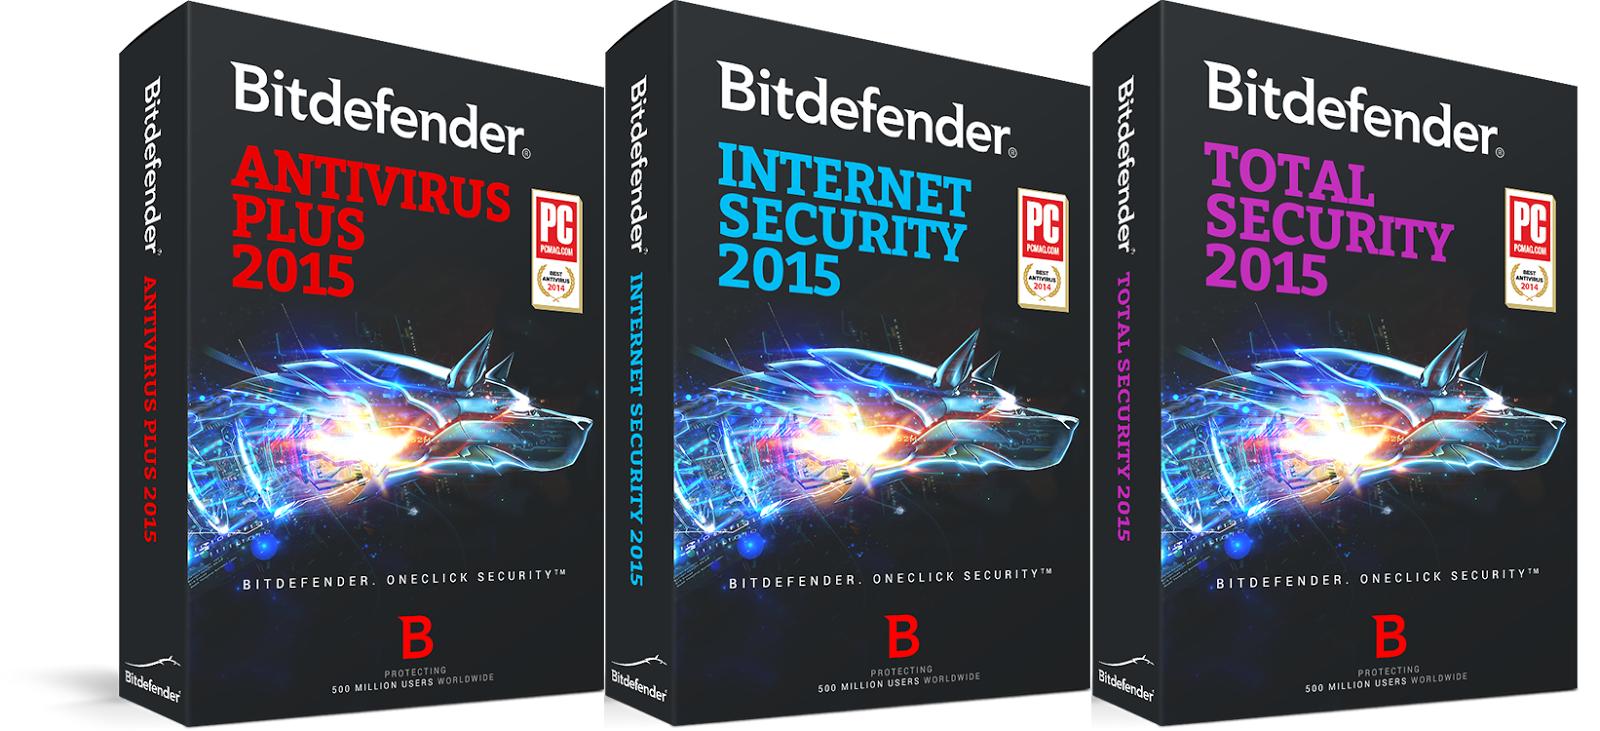 Ưu điểm vượt trội của key bitdefender antivirus plus 2015